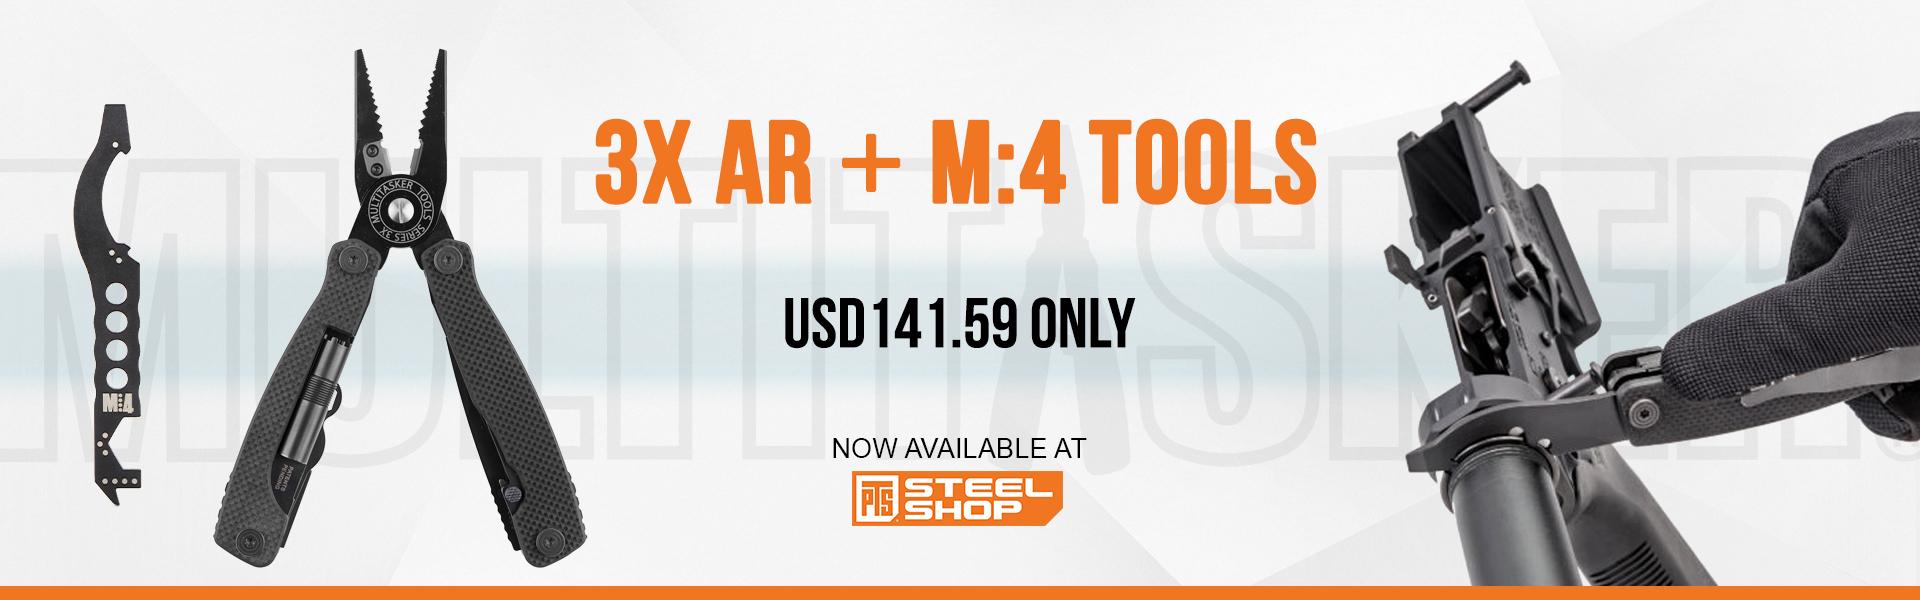 pts steel shop,3x,AR-15,MultiTasker,Tools,Series 3X